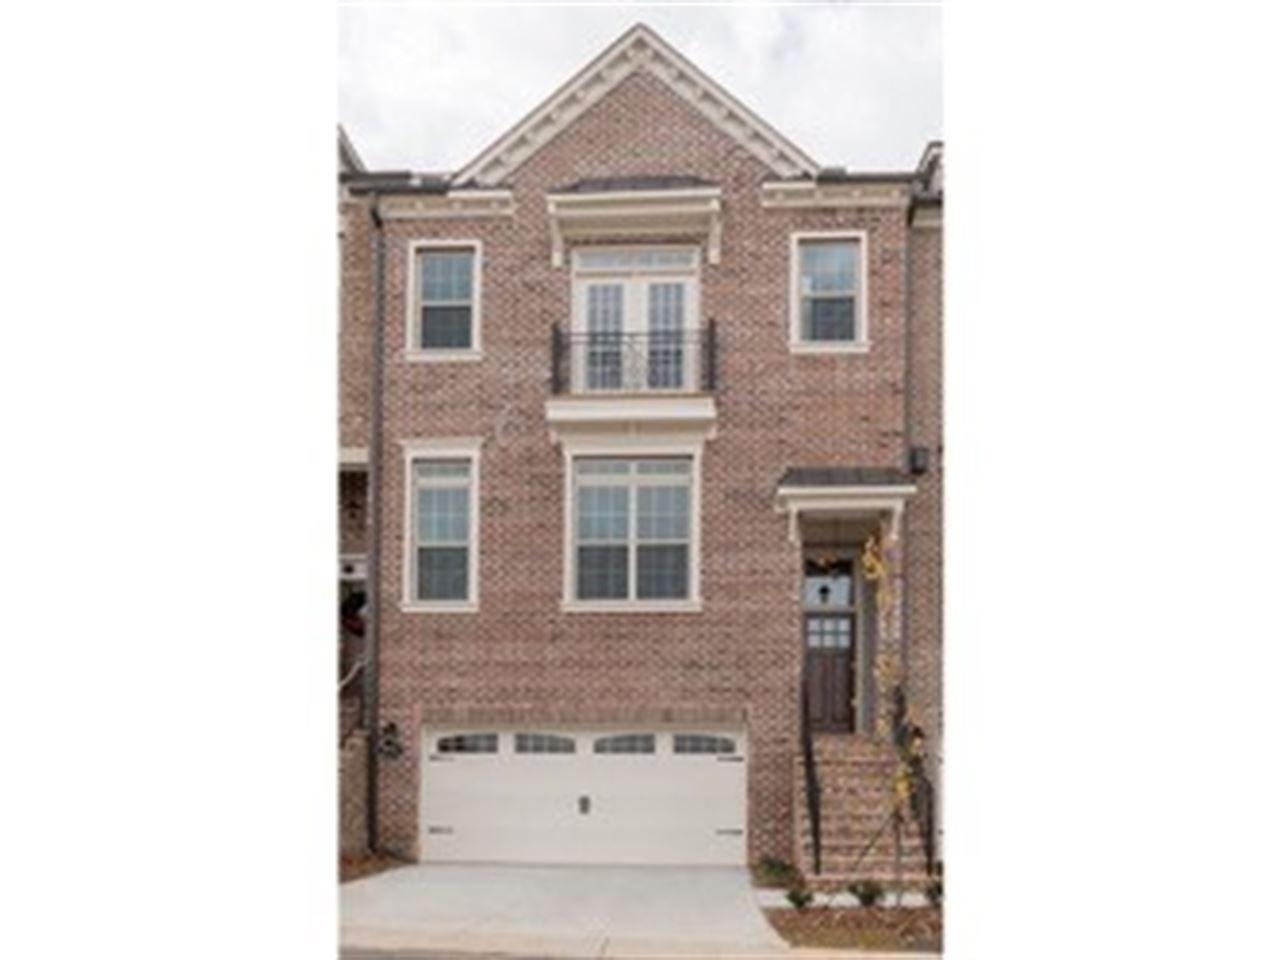 2734 AVINGTON LANE, Vinings, GA Homes & Land - Real Estate